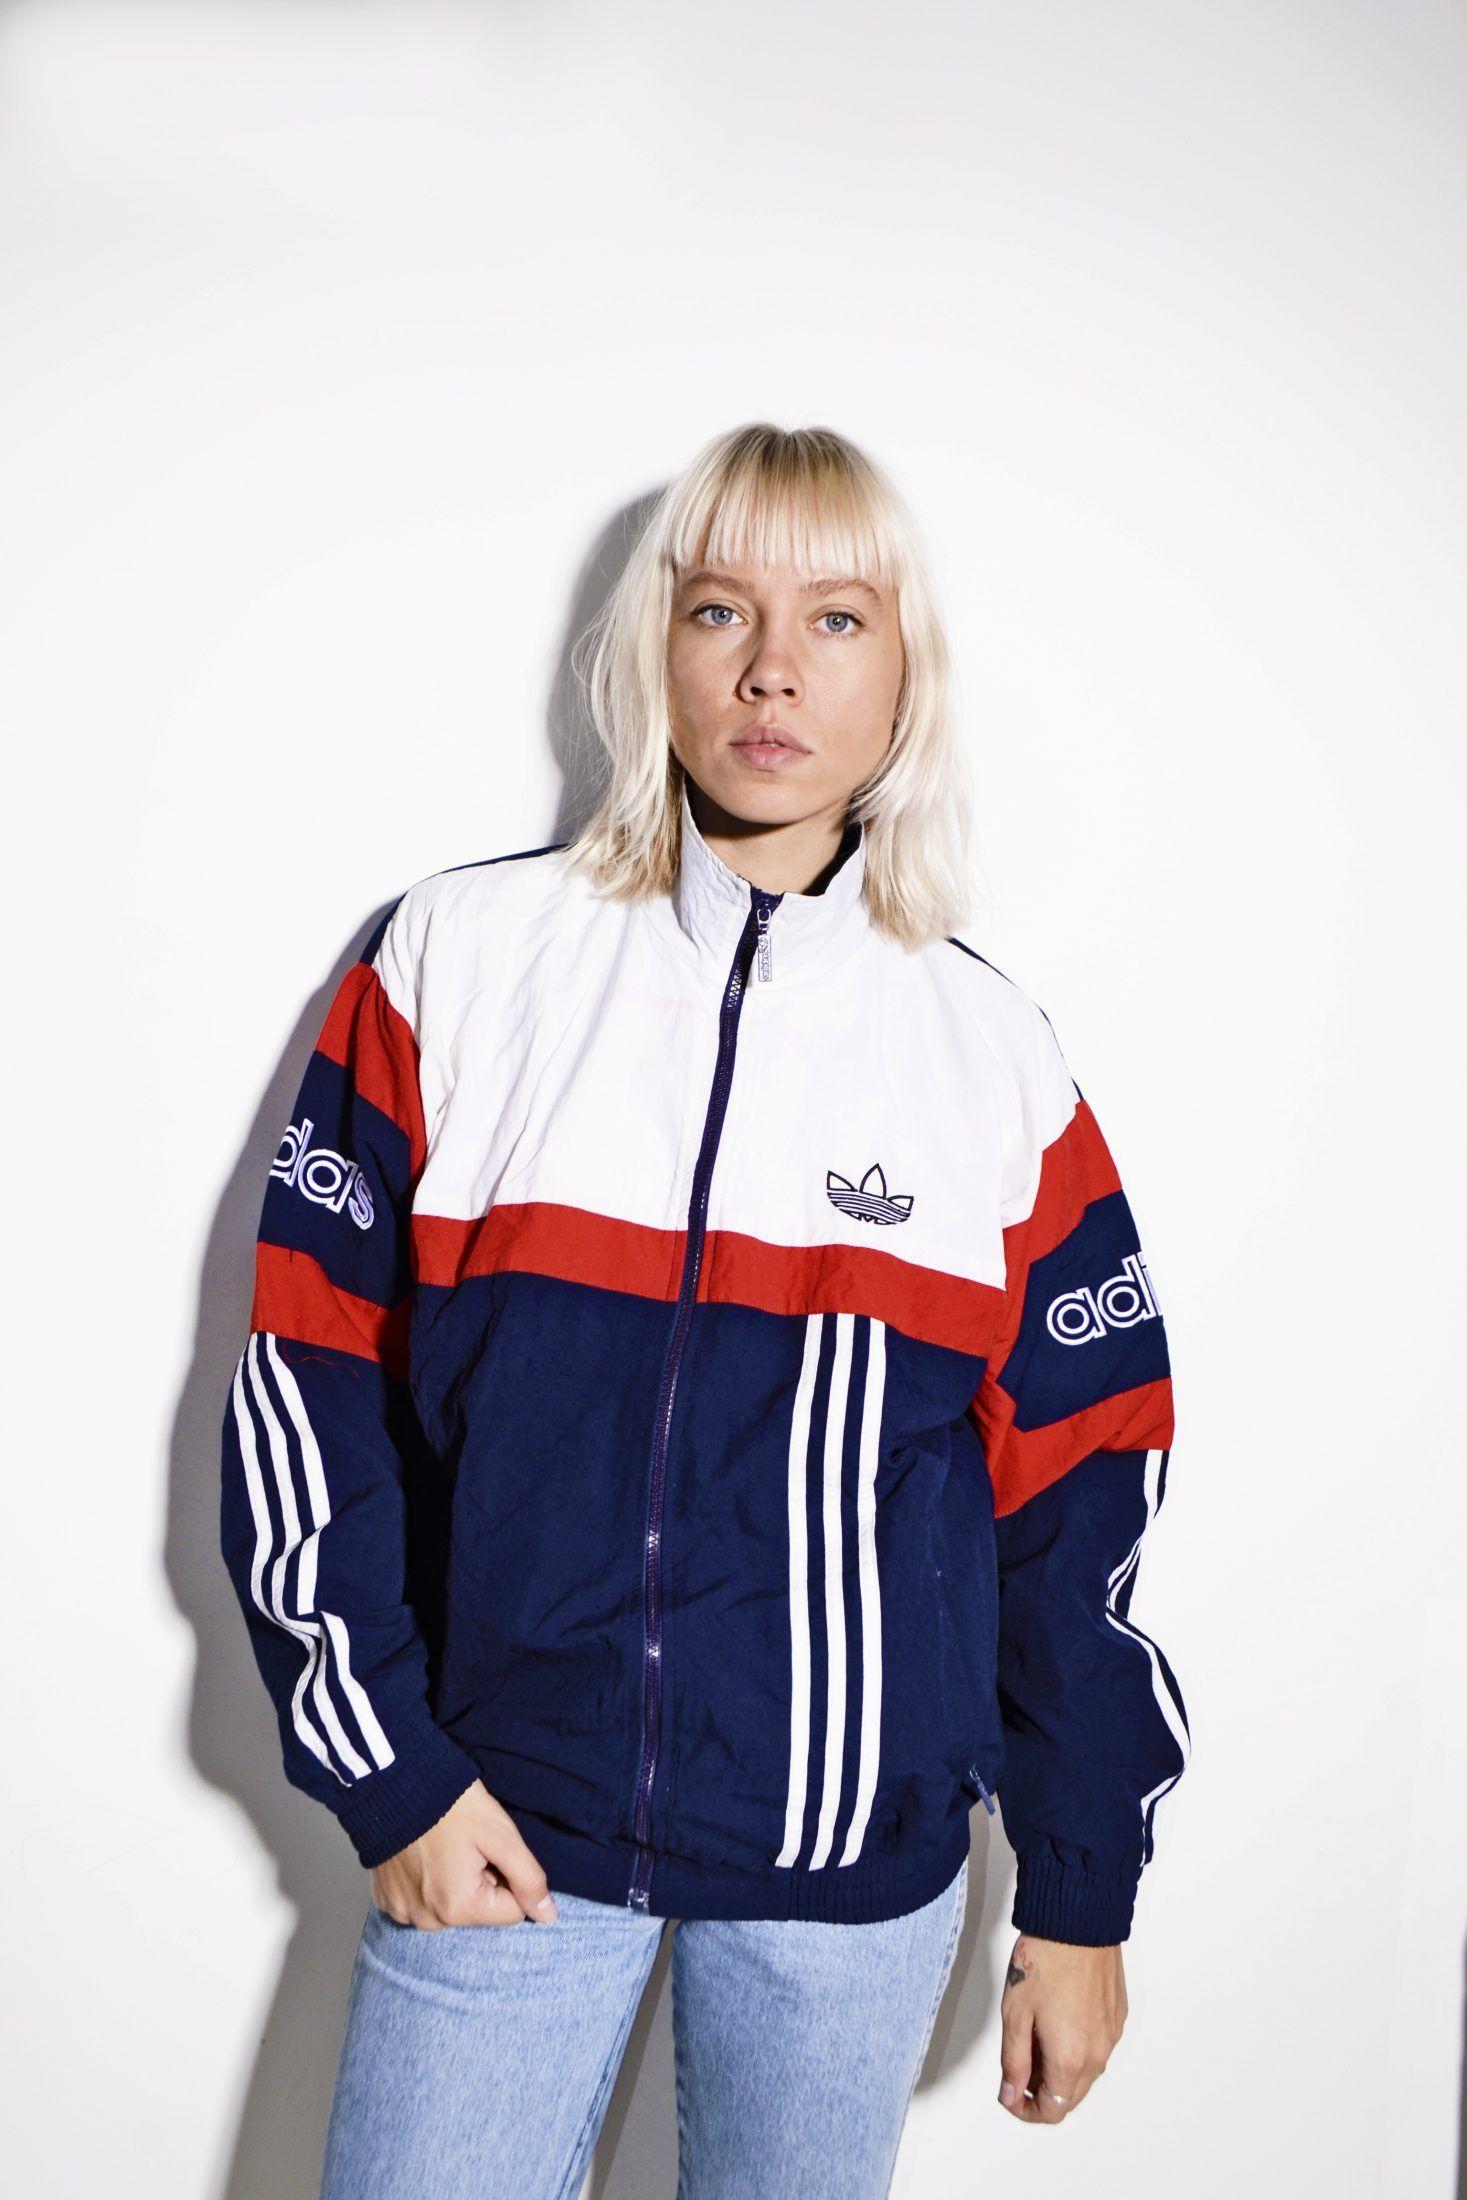 Adidas Originals Vintage 90s Jacket Vintage Clothing Online Tracksuit Tops Vintage Outfits